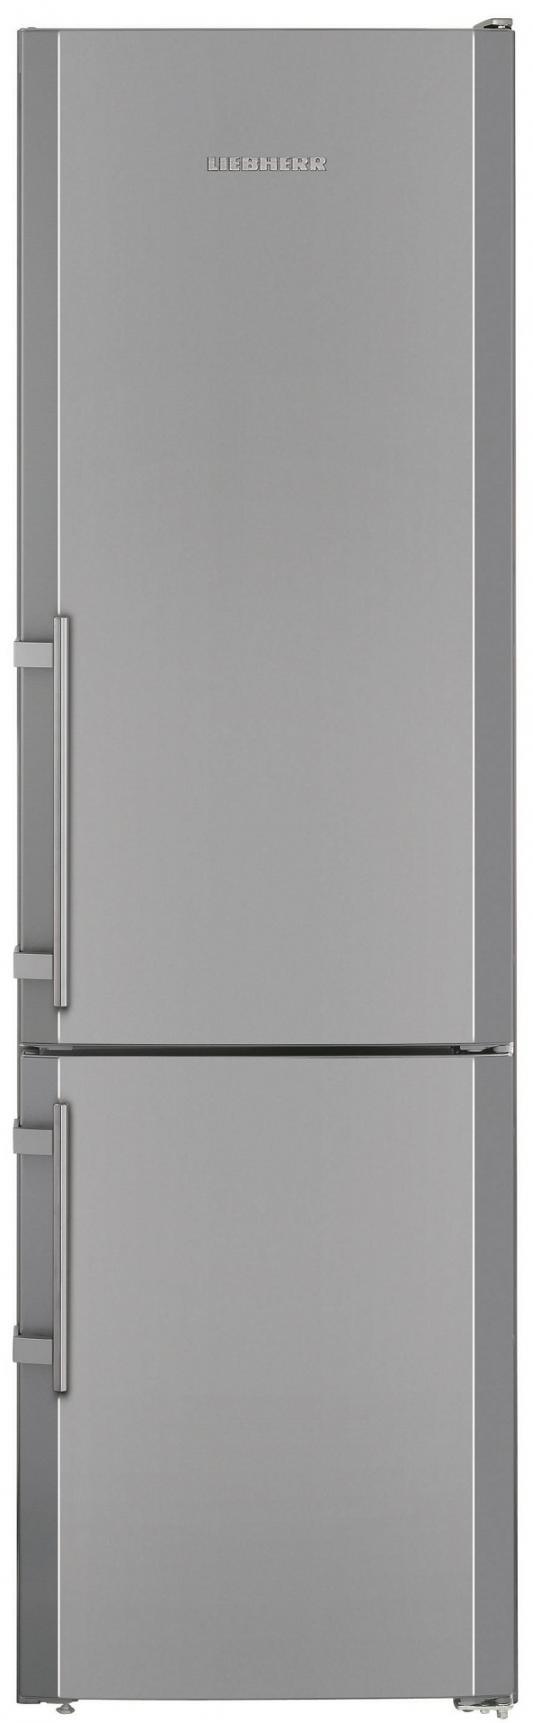 Холодильник Liebherr CNef 4315-20 001 серебристый